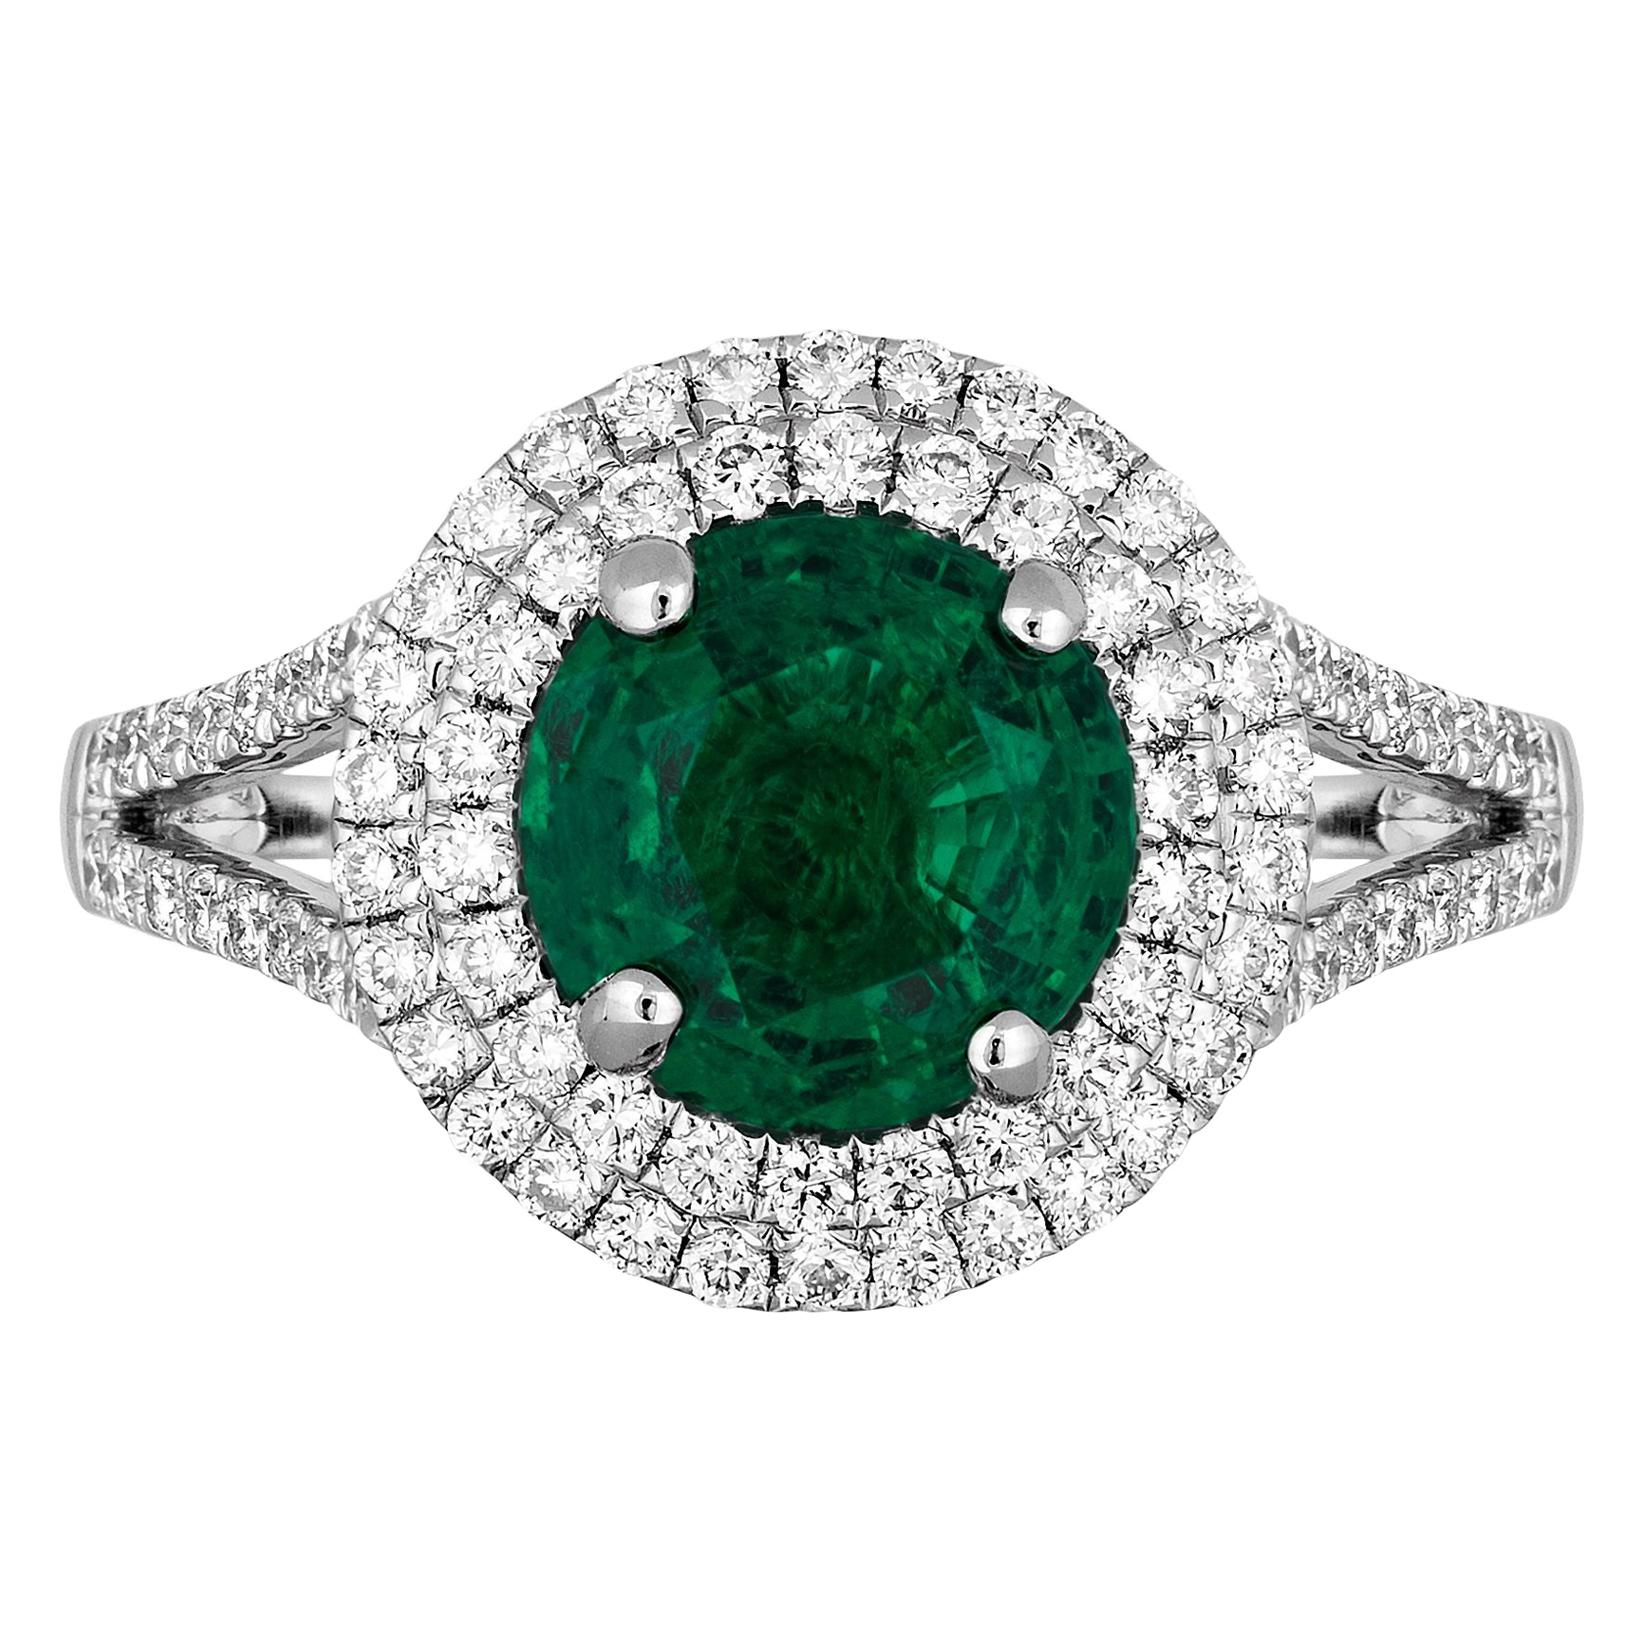 1.25 Carat Zambian Emerald Diamond Cocktail Ring